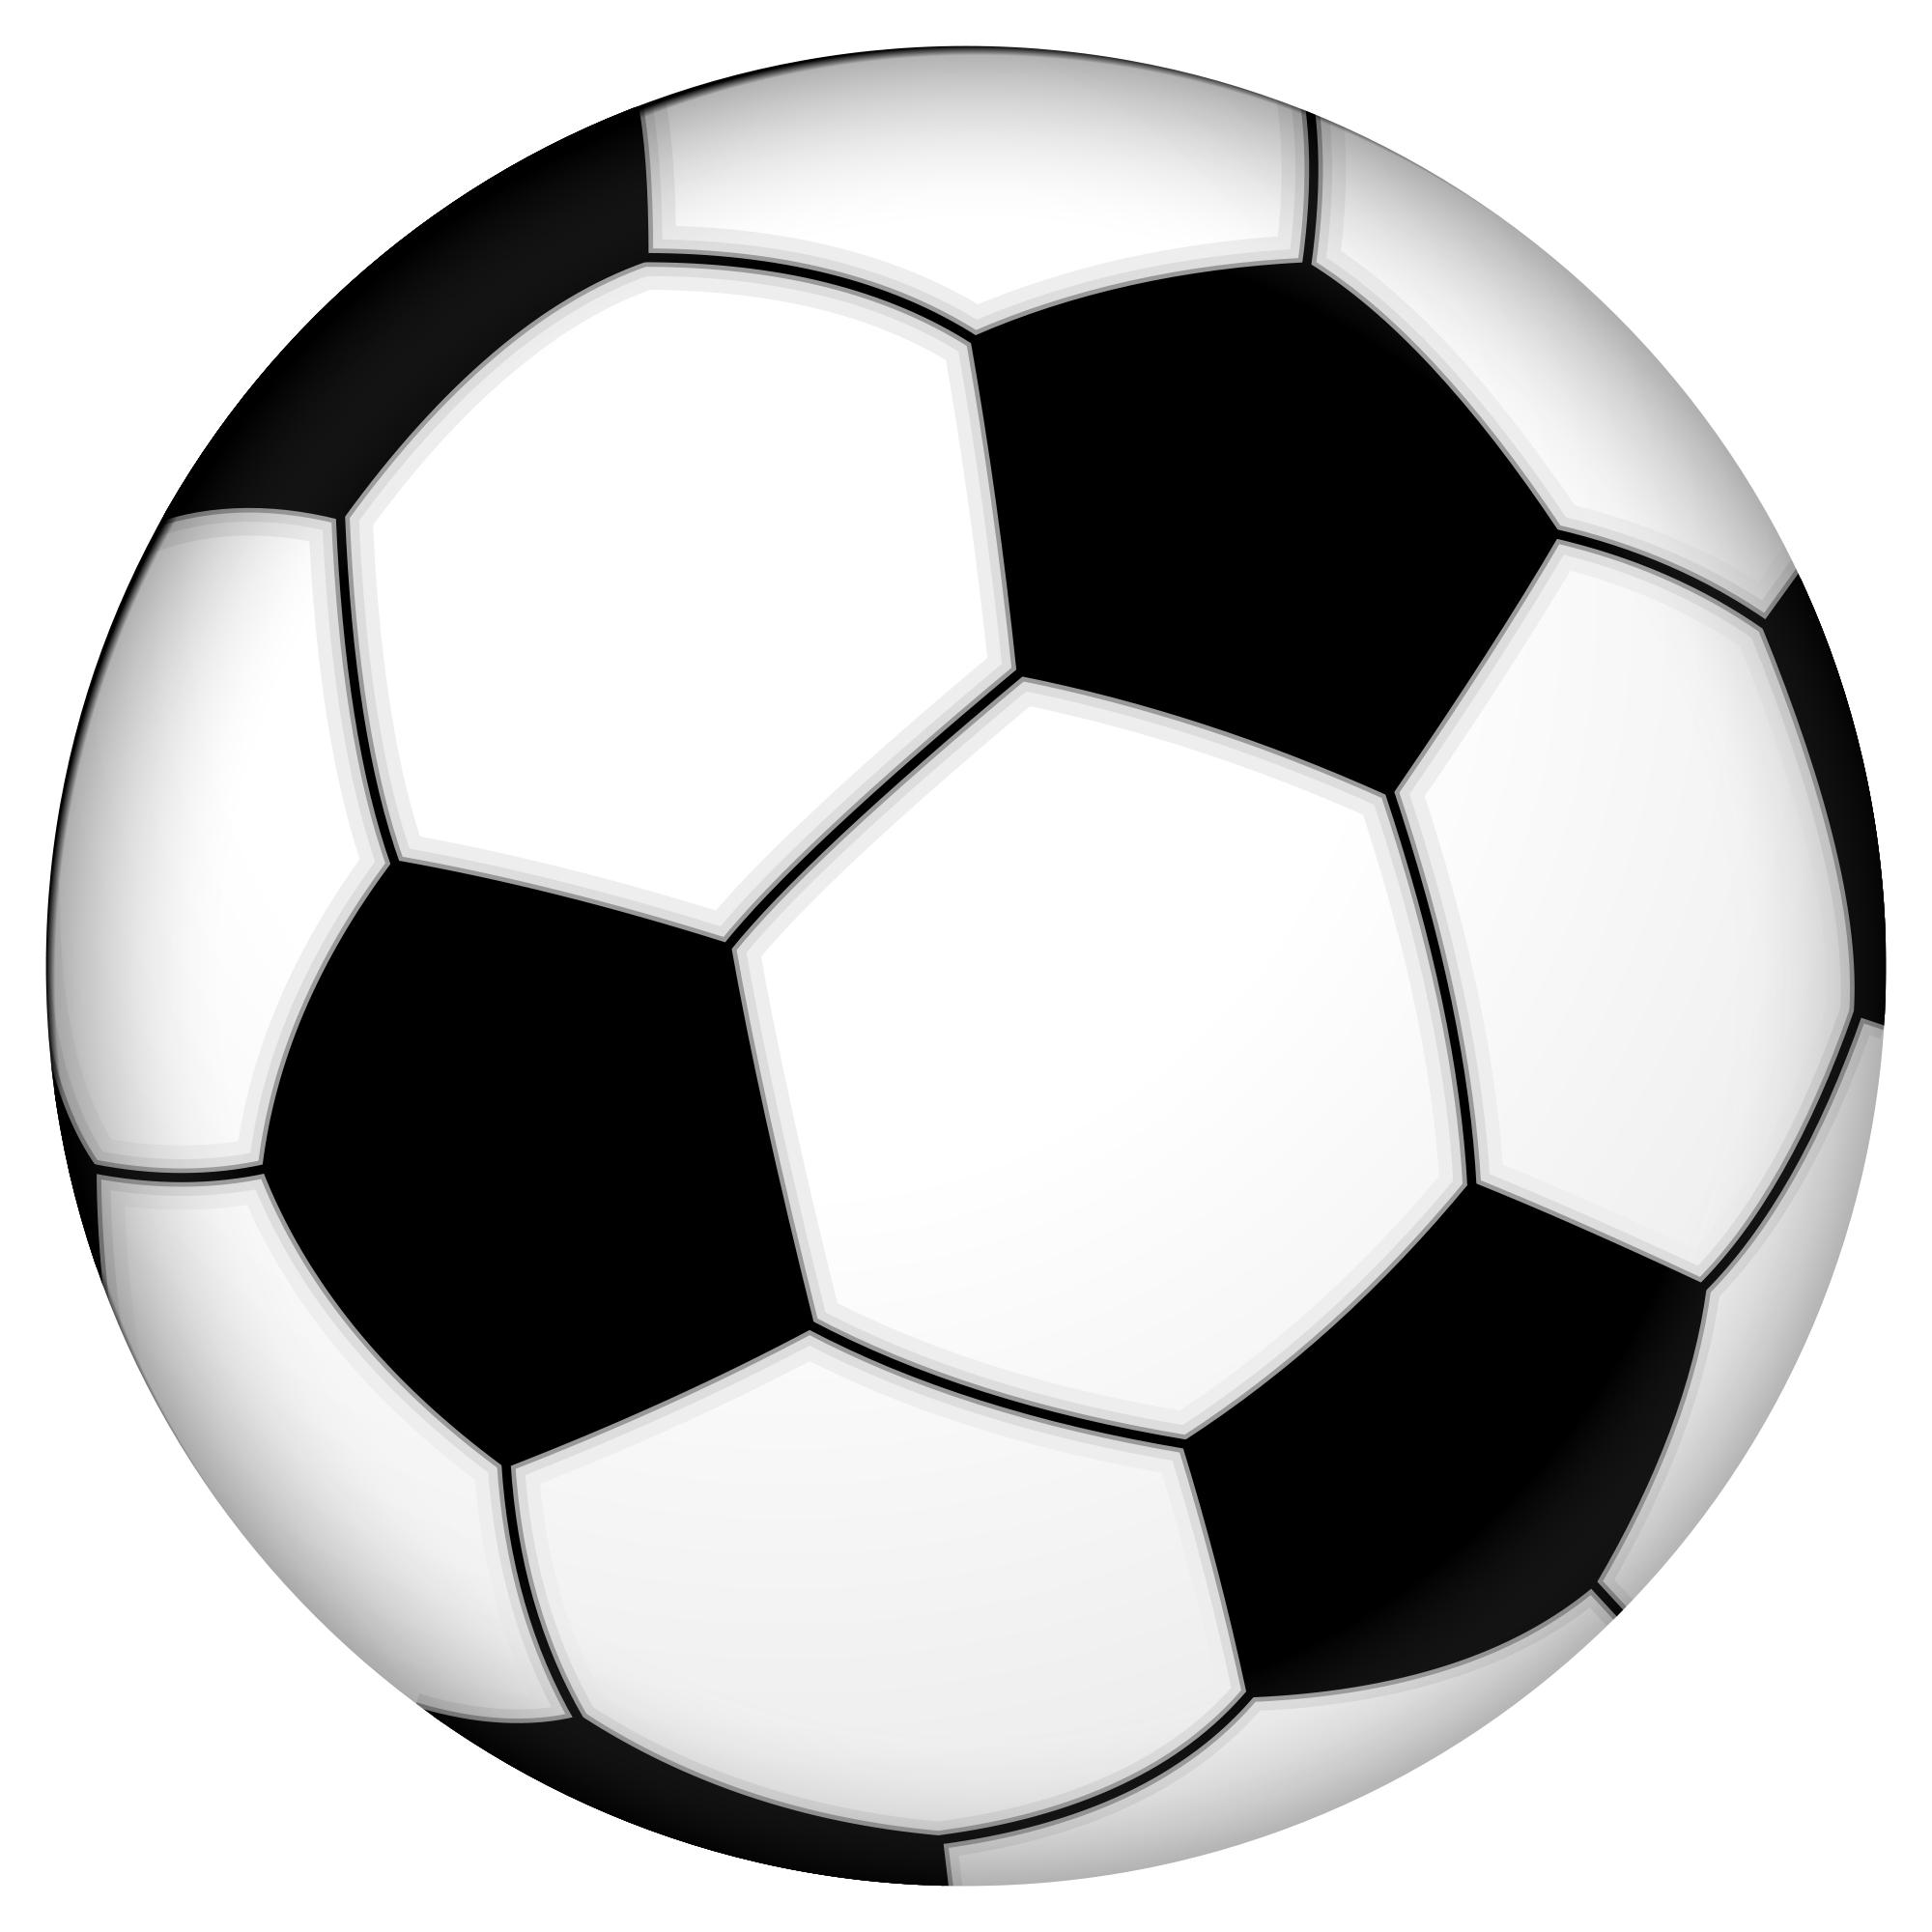 Clip art soccer ball image transparent stock Kicking Soccer Ball Clipart - Clipart Kid image transparent stock